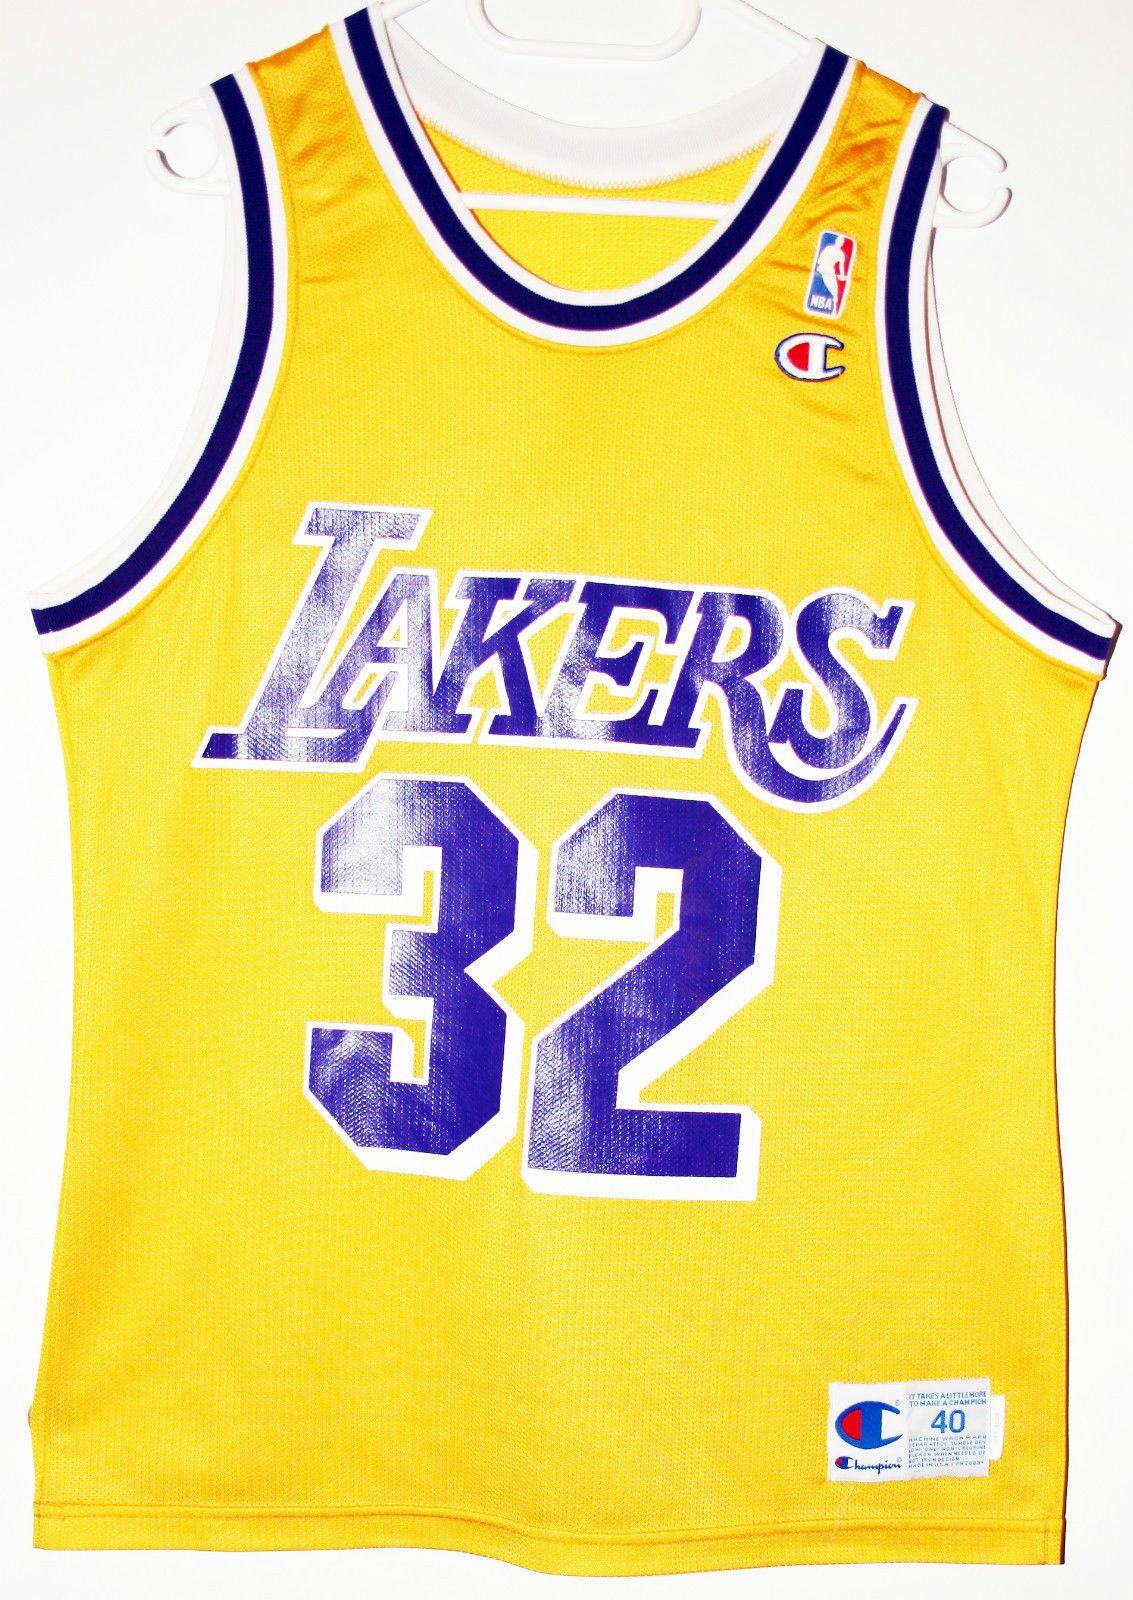 Champion NBA Basketball Los Angeles Lakers #32 Magic Johnson Trikot / Jersey  Size 40 -